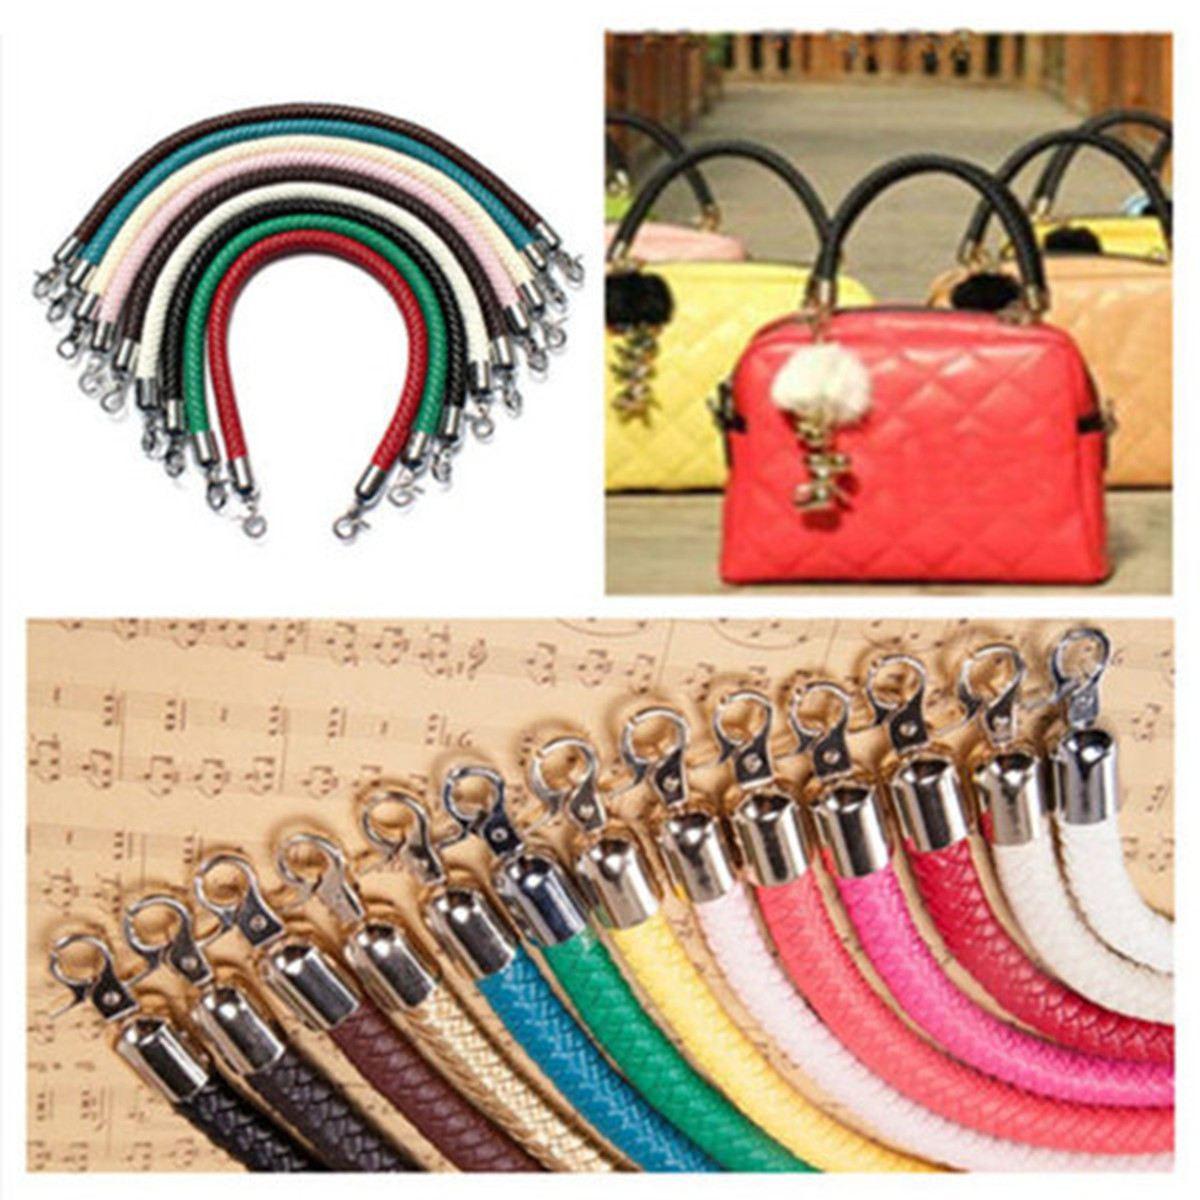 AEQUEEN 53.4CM DIY Bag Strap Handle Detachable Replacement Belts Bag Handle Bands Handbag Strap Bag Accessories Parts Silver